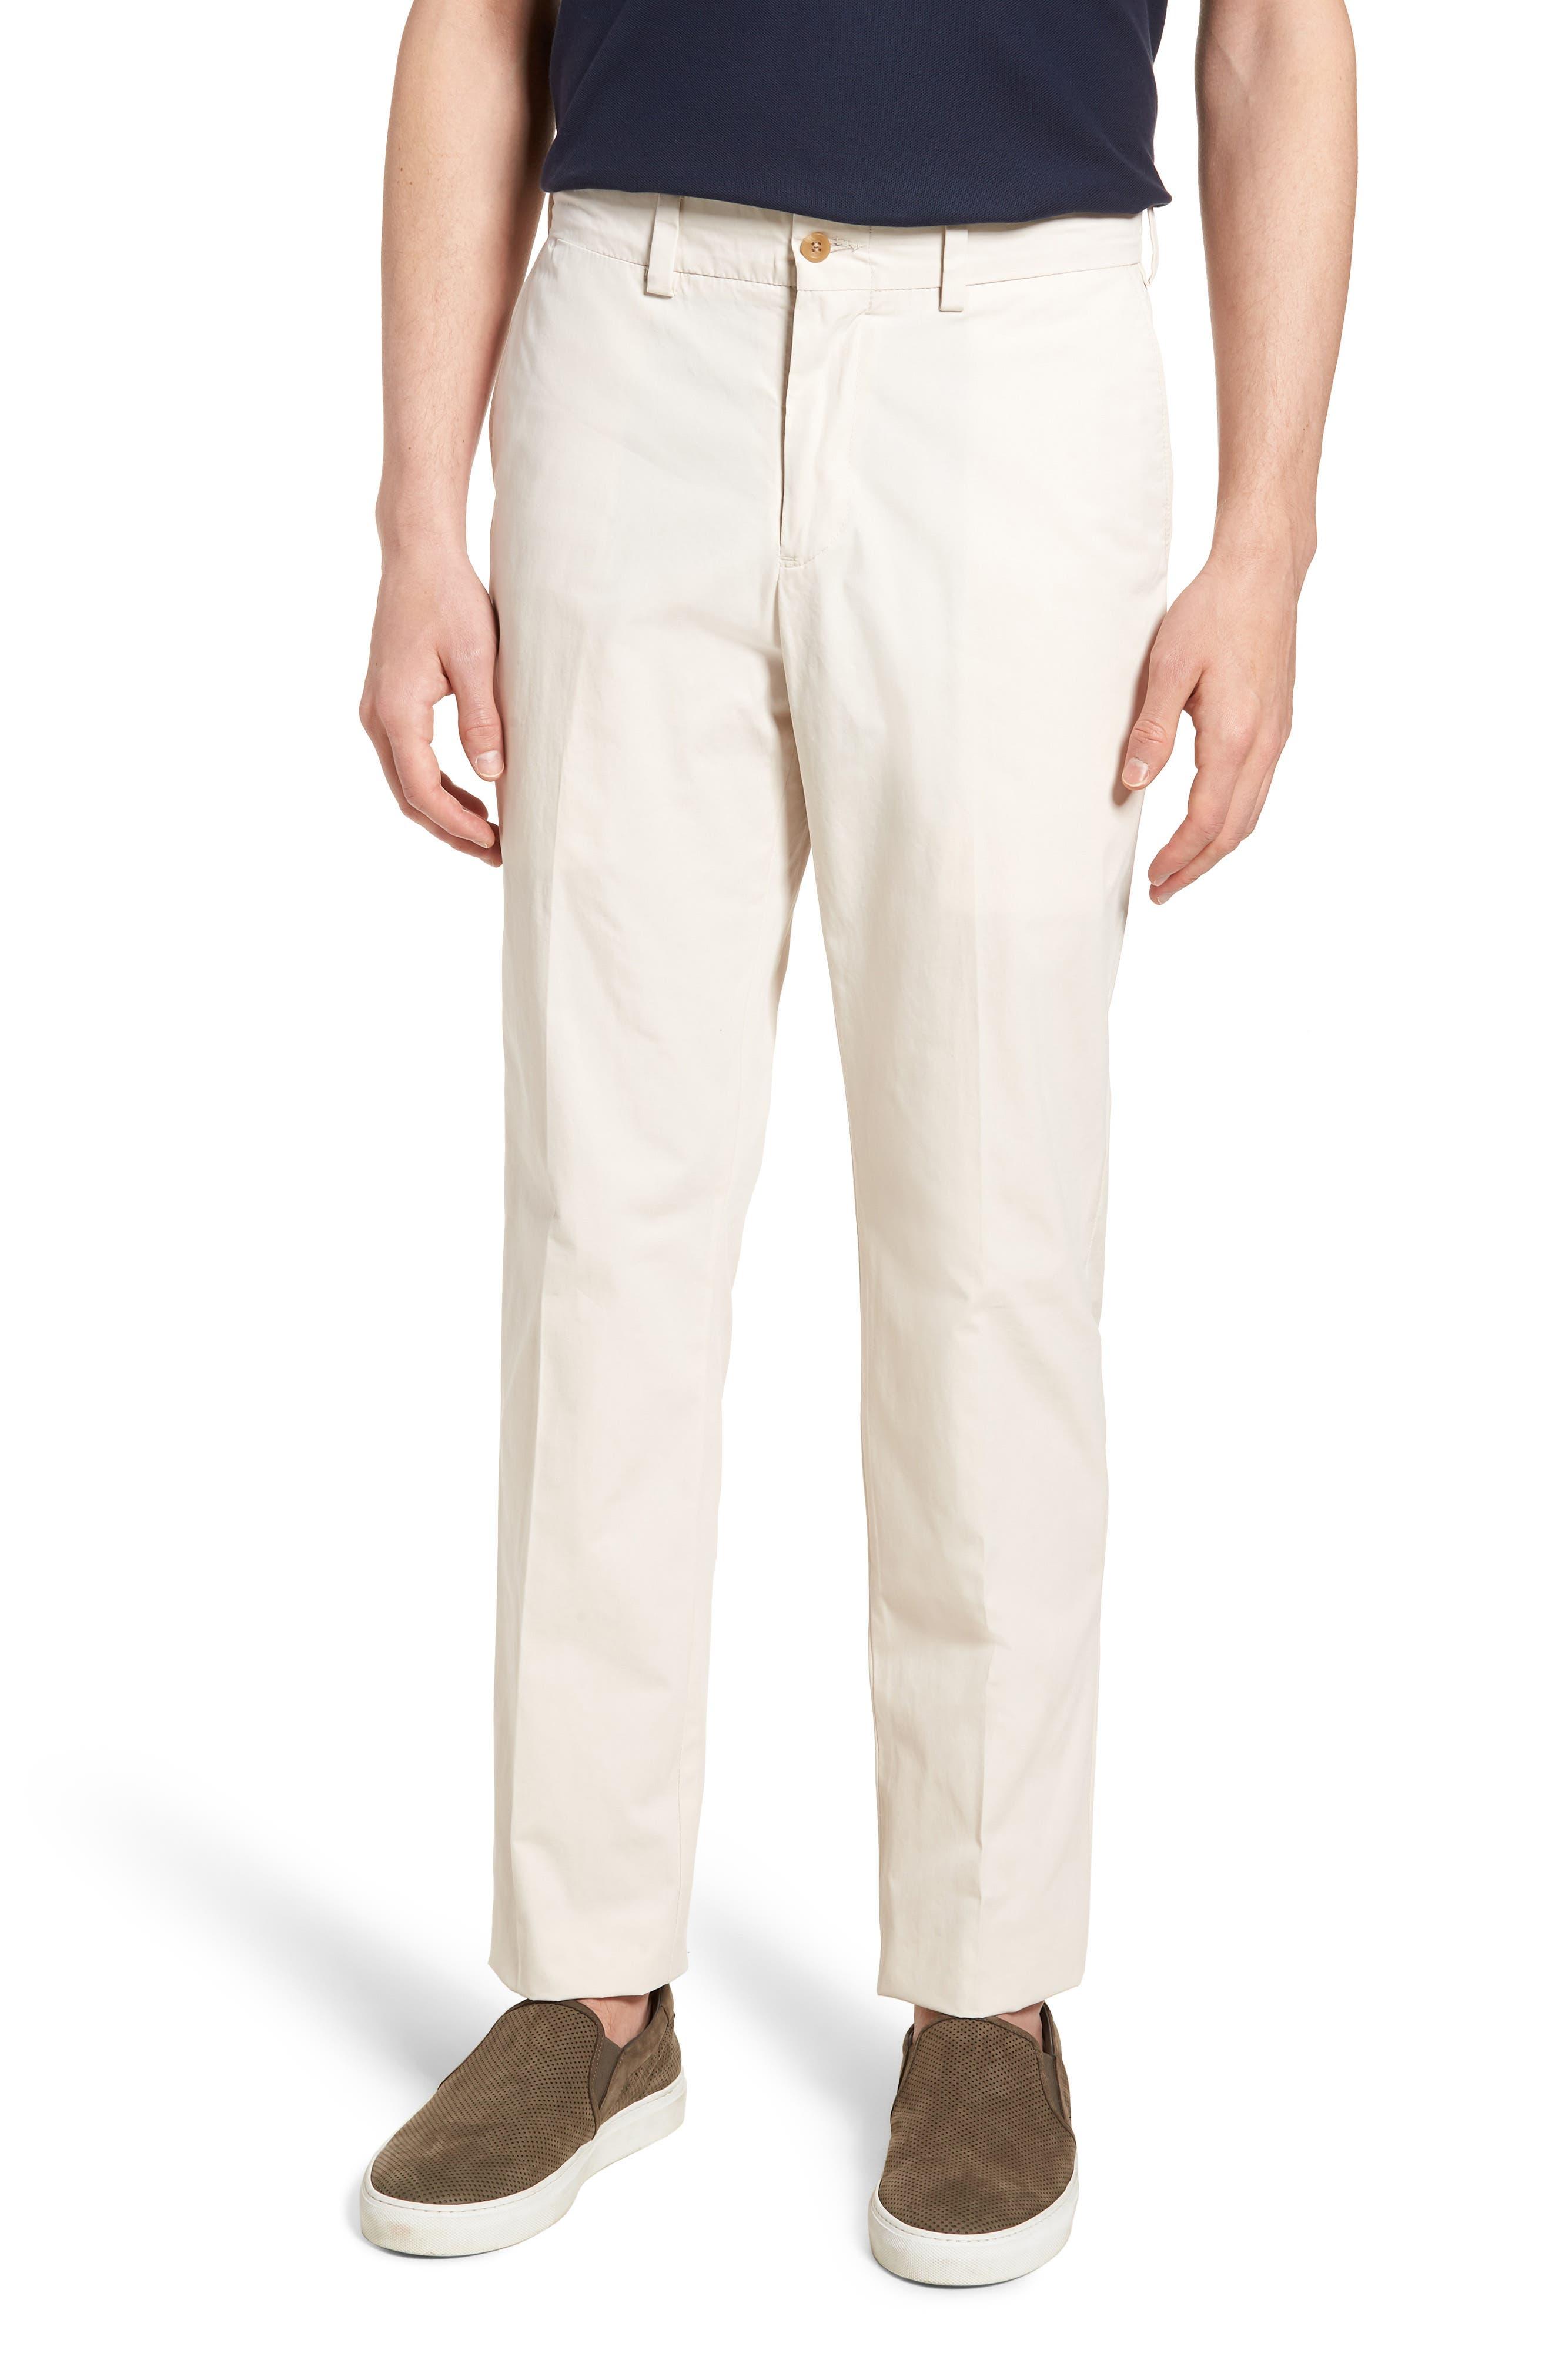 M3 Straight Fit Flat Front Tropical Poplin Pants,                             Main thumbnail 1, color,                             Sand